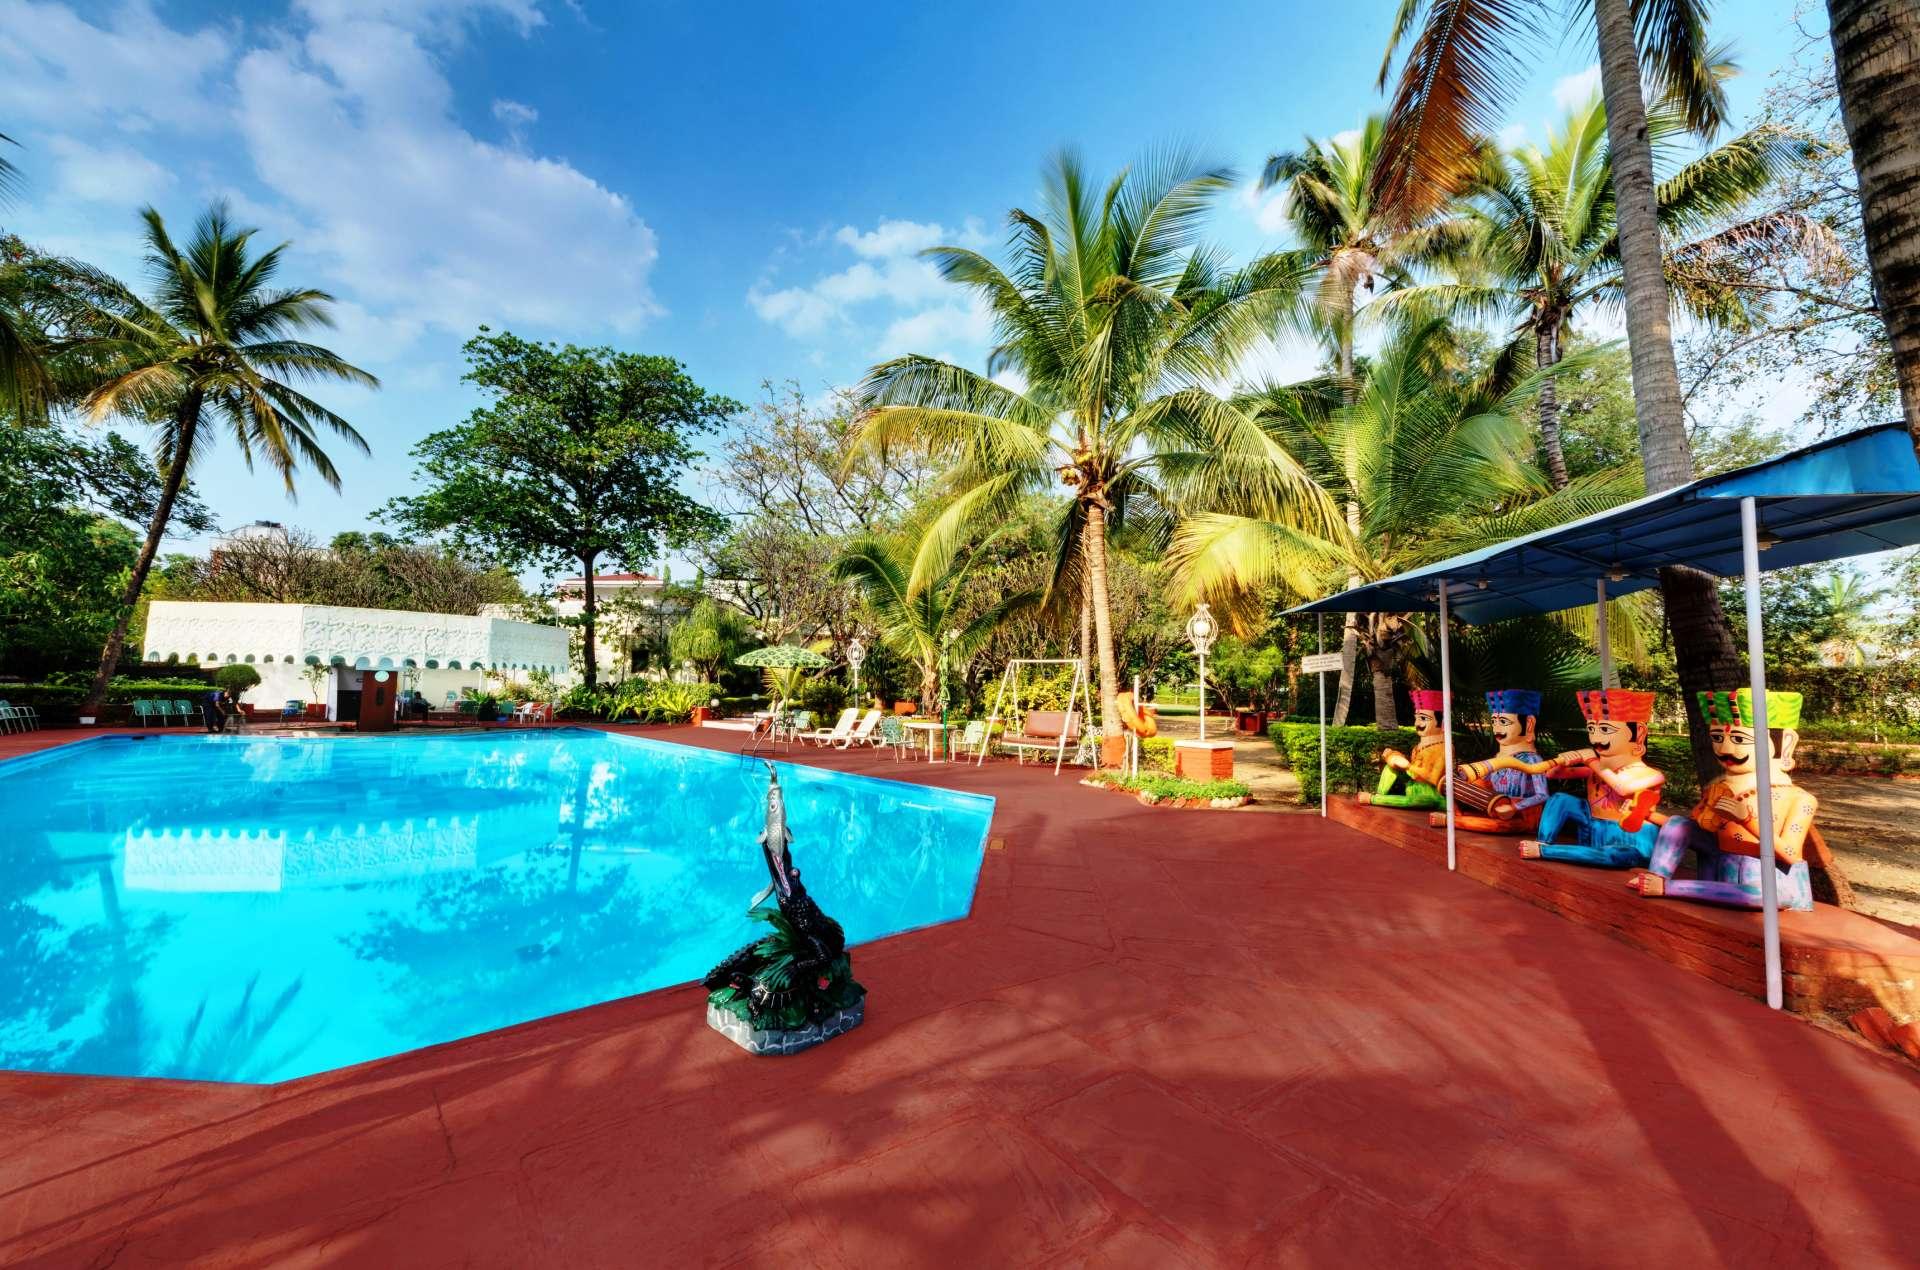 swimming pool ambassador ajanta aurangabad - The Ambassador | Heritage Hotels in Mumbai, Aurangabad, Chennai - Demo Group Home Page